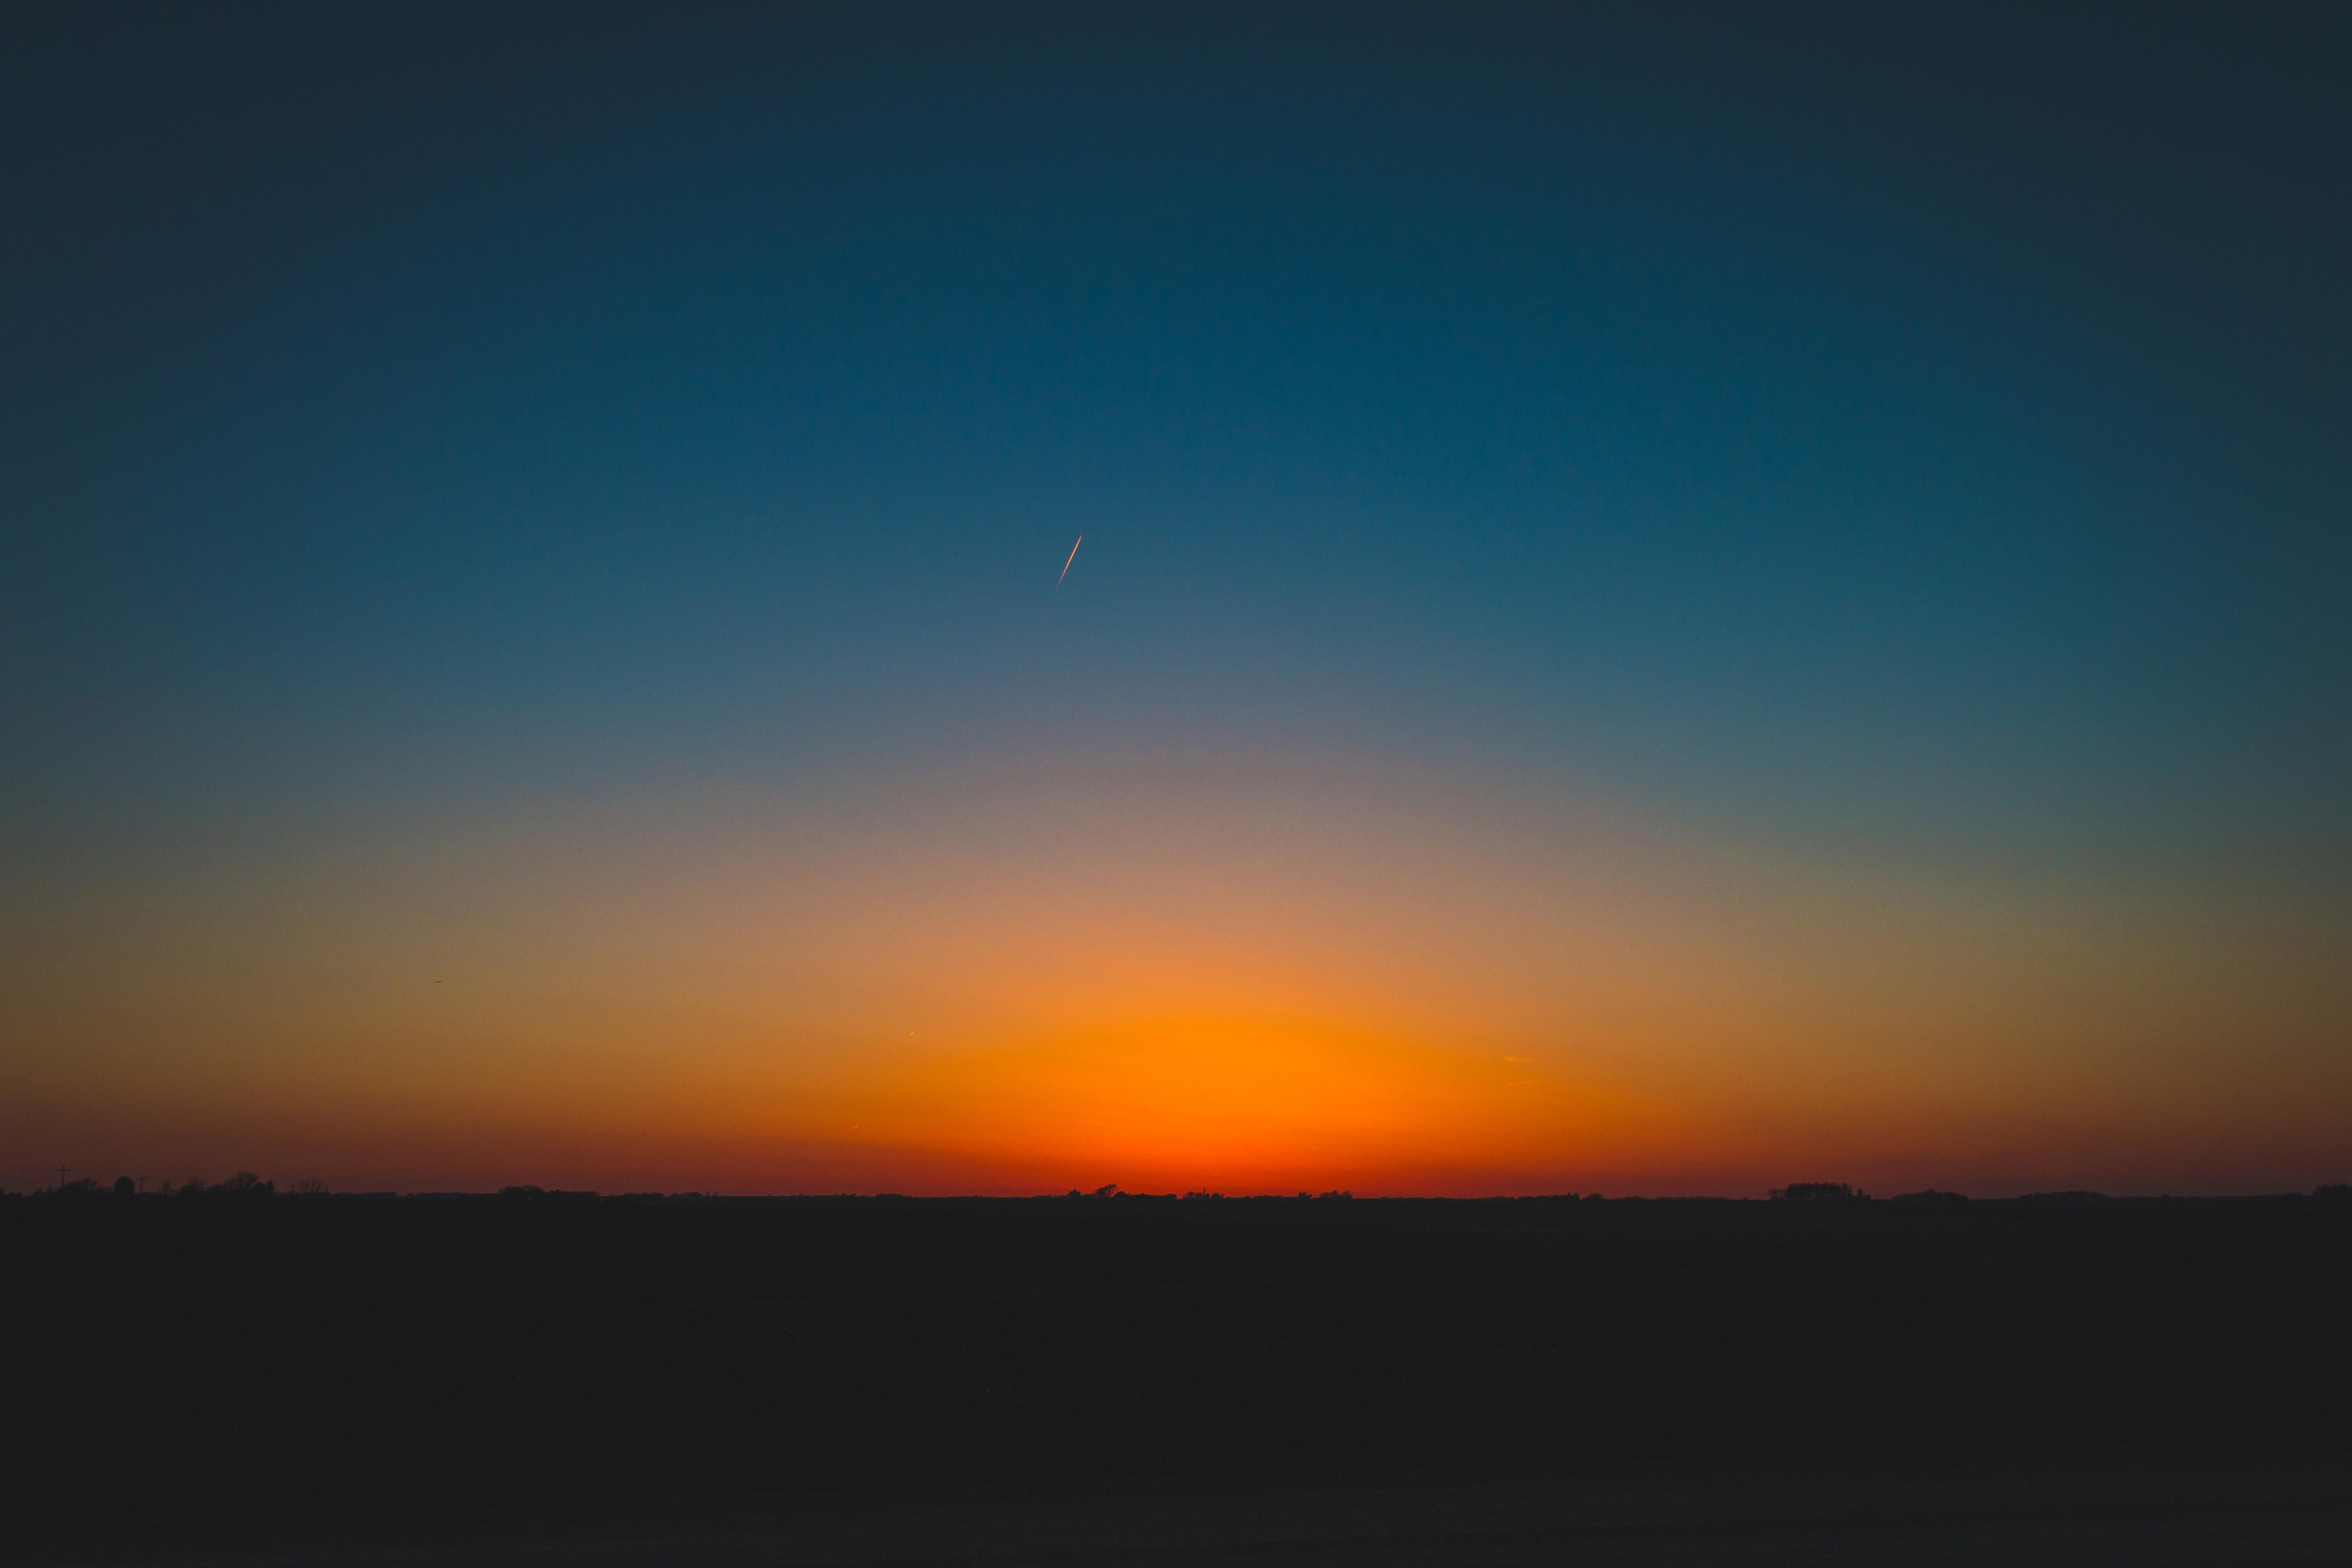 Beautiful sunset, afternoon, sunset, dusk, sky, night, evening, dark, silhouette, shadow, landscape, nature